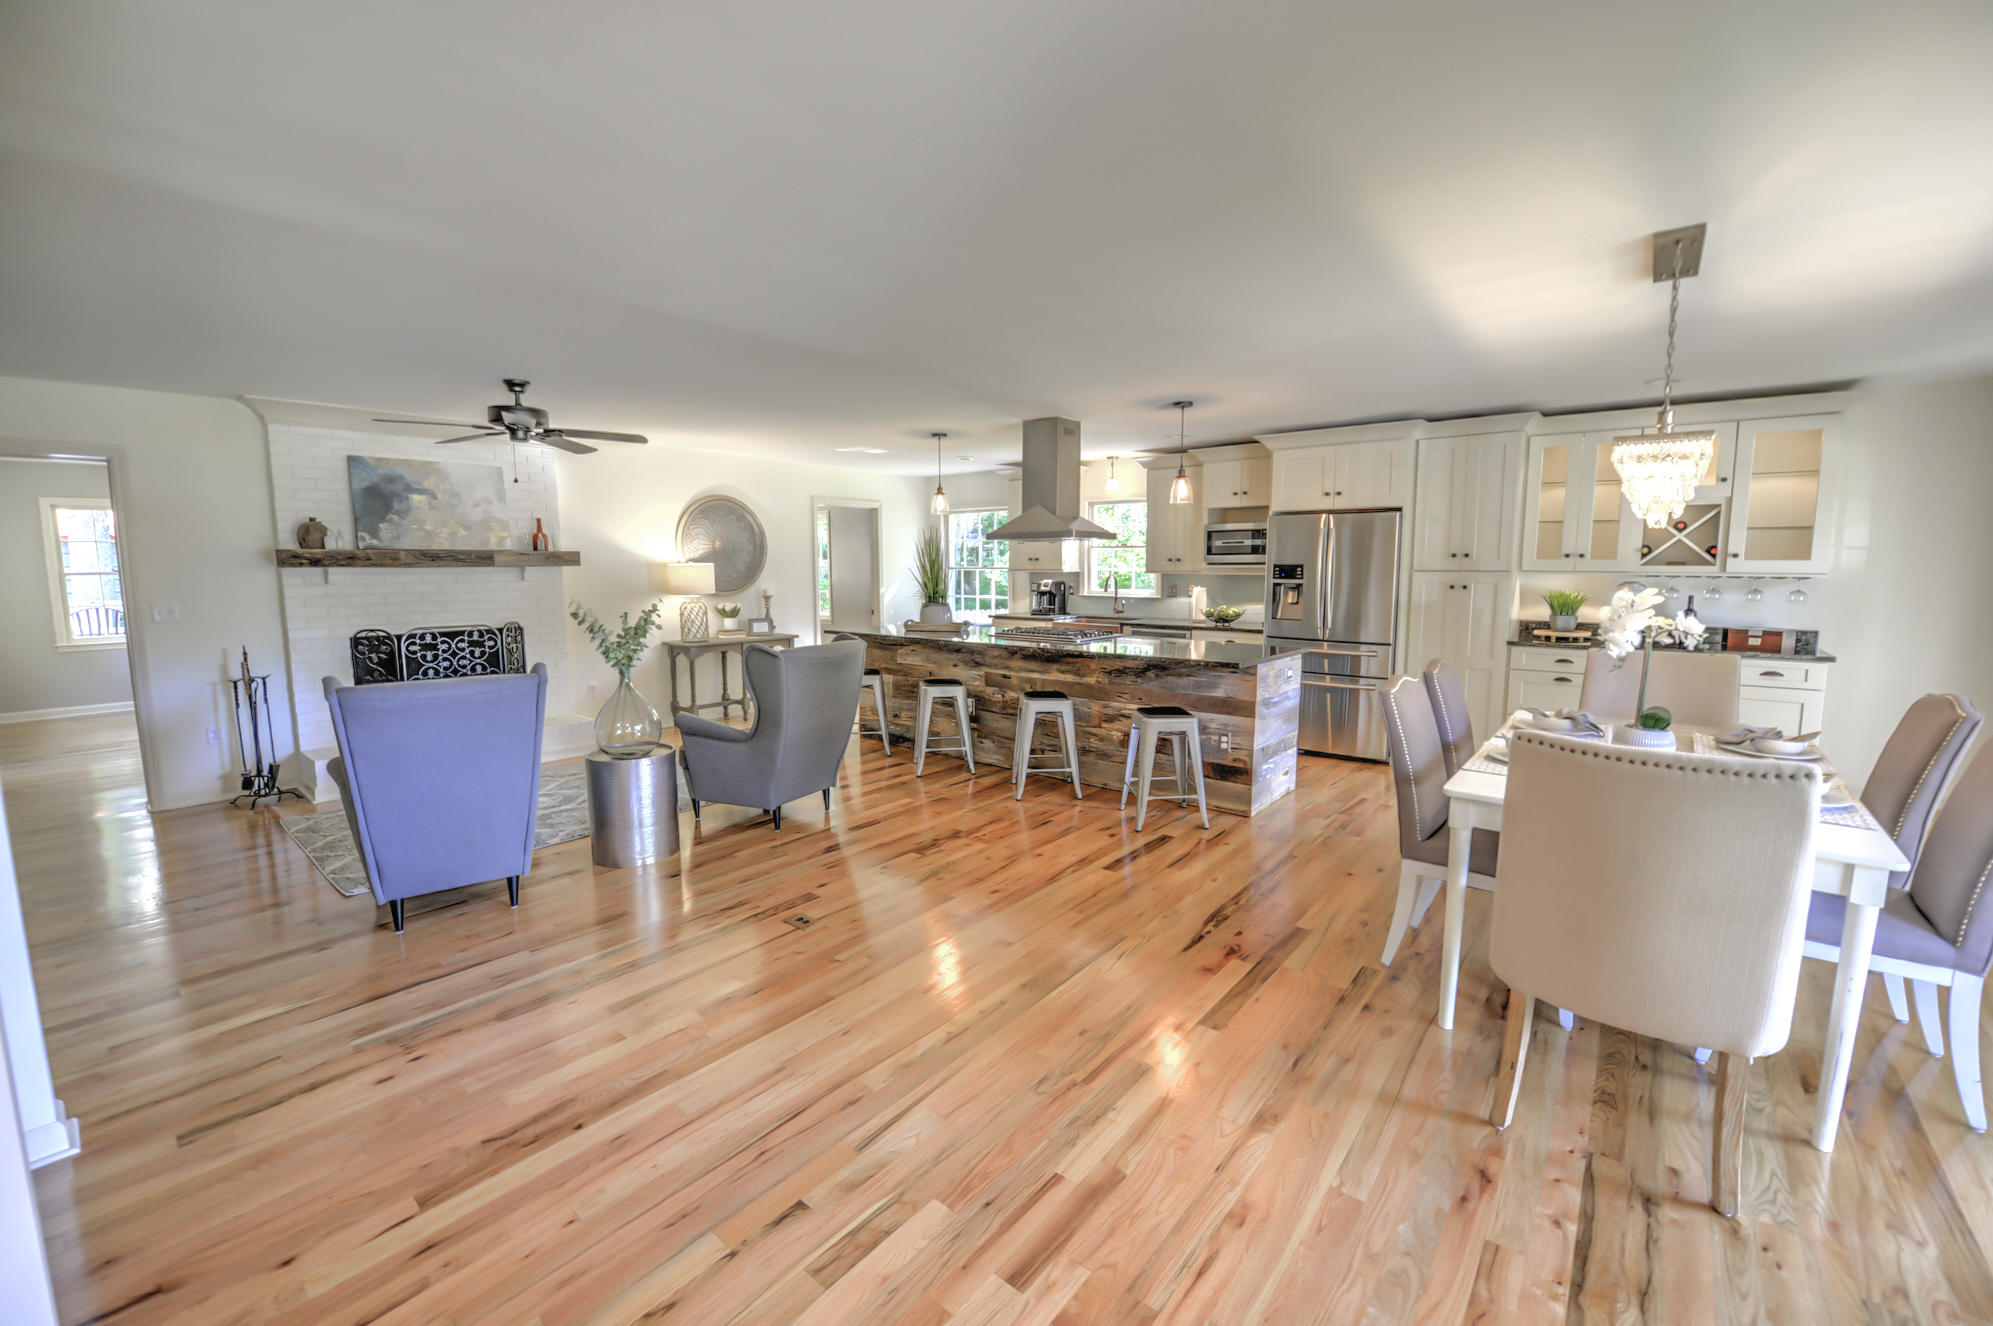 Shemwood II Homes For Sale - 1017 Jack Snipe, Mount Pleasant, SC - 14